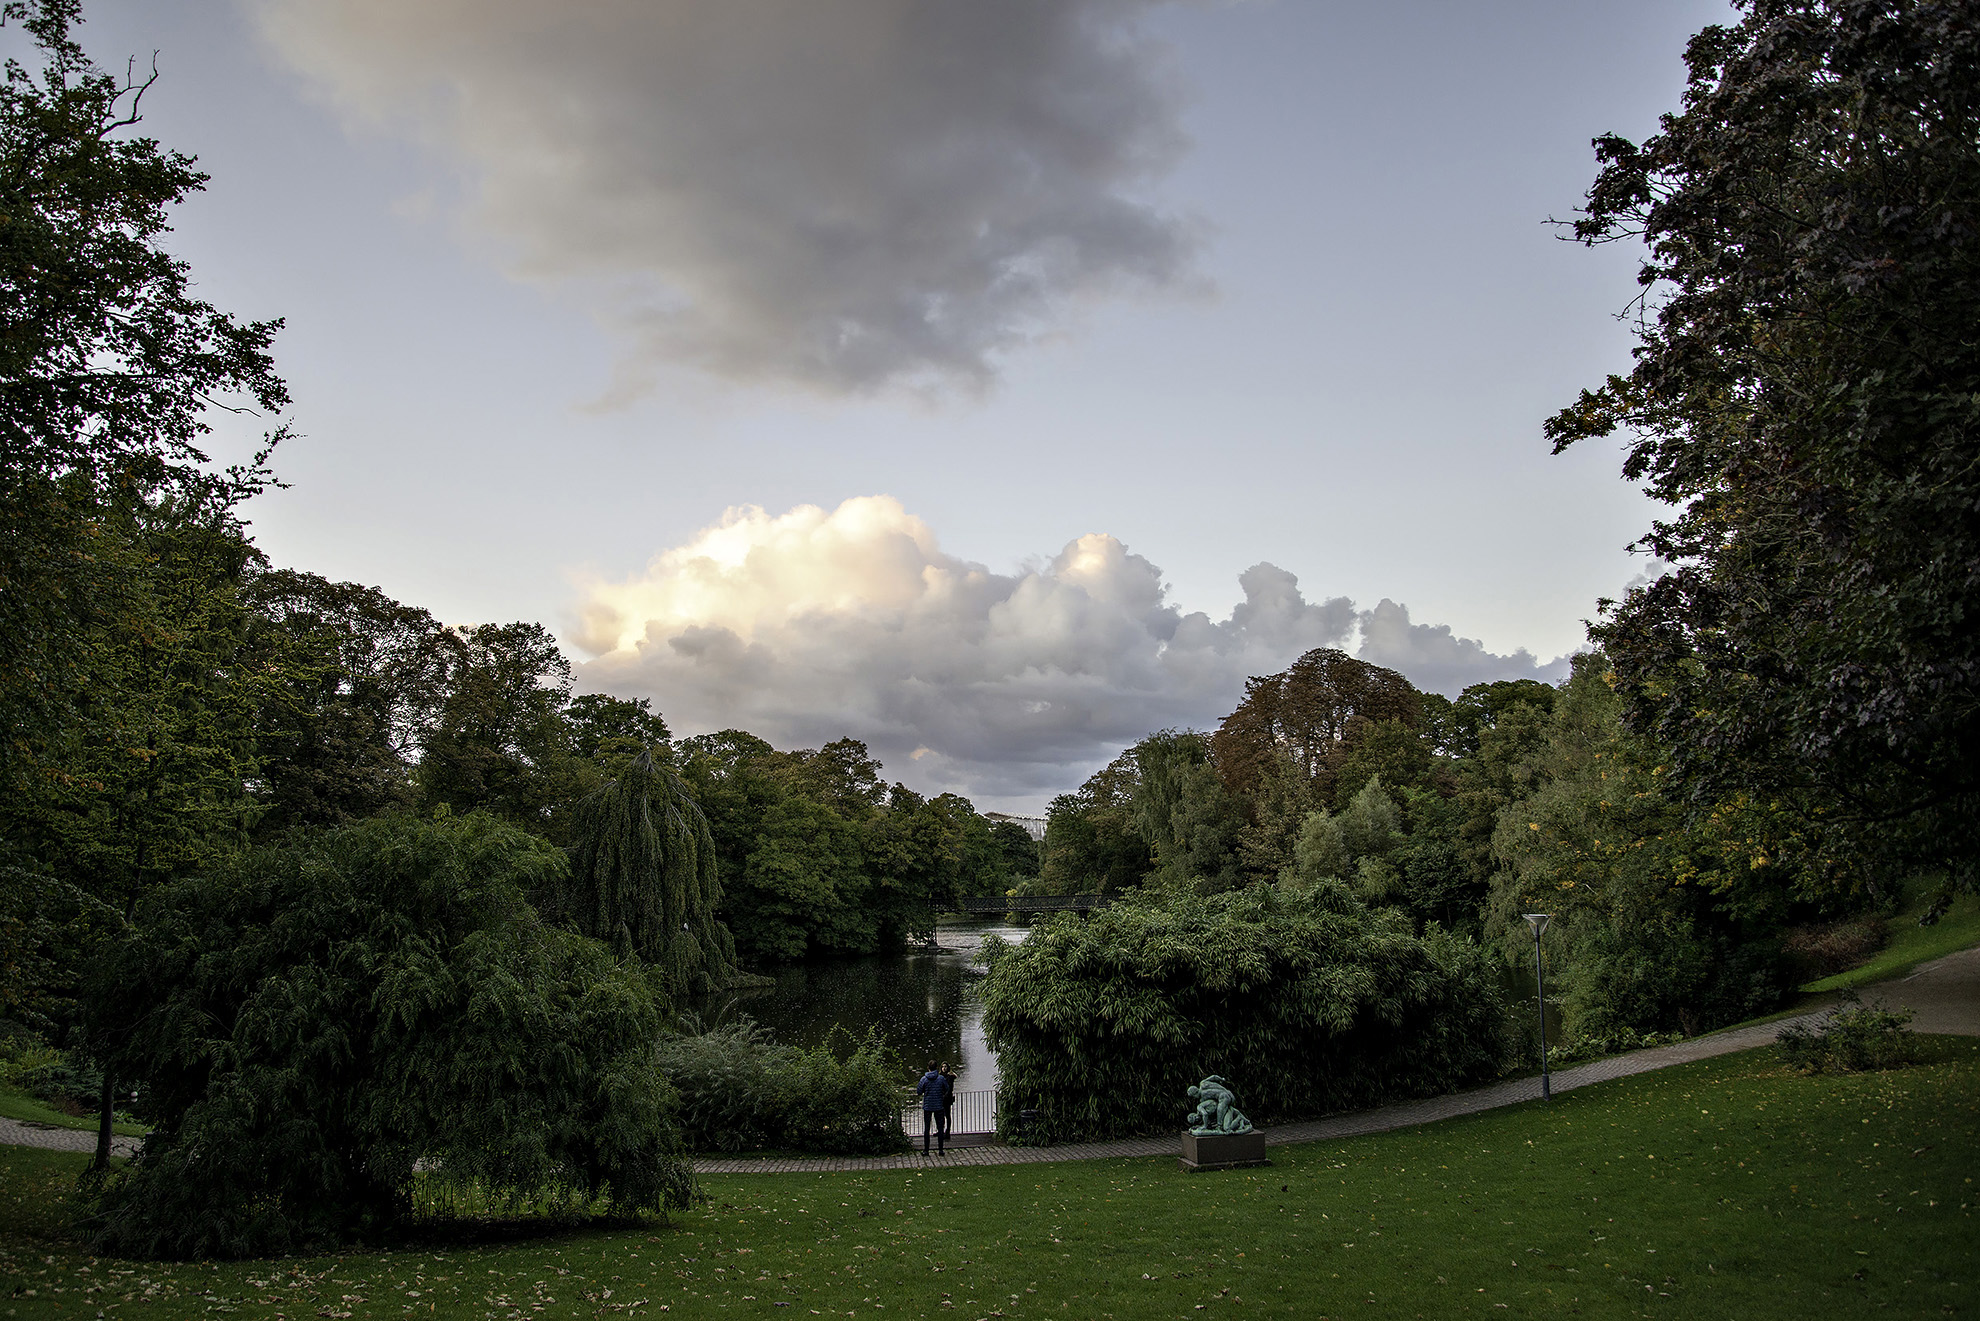 Ørstedsparken, Copenhagen